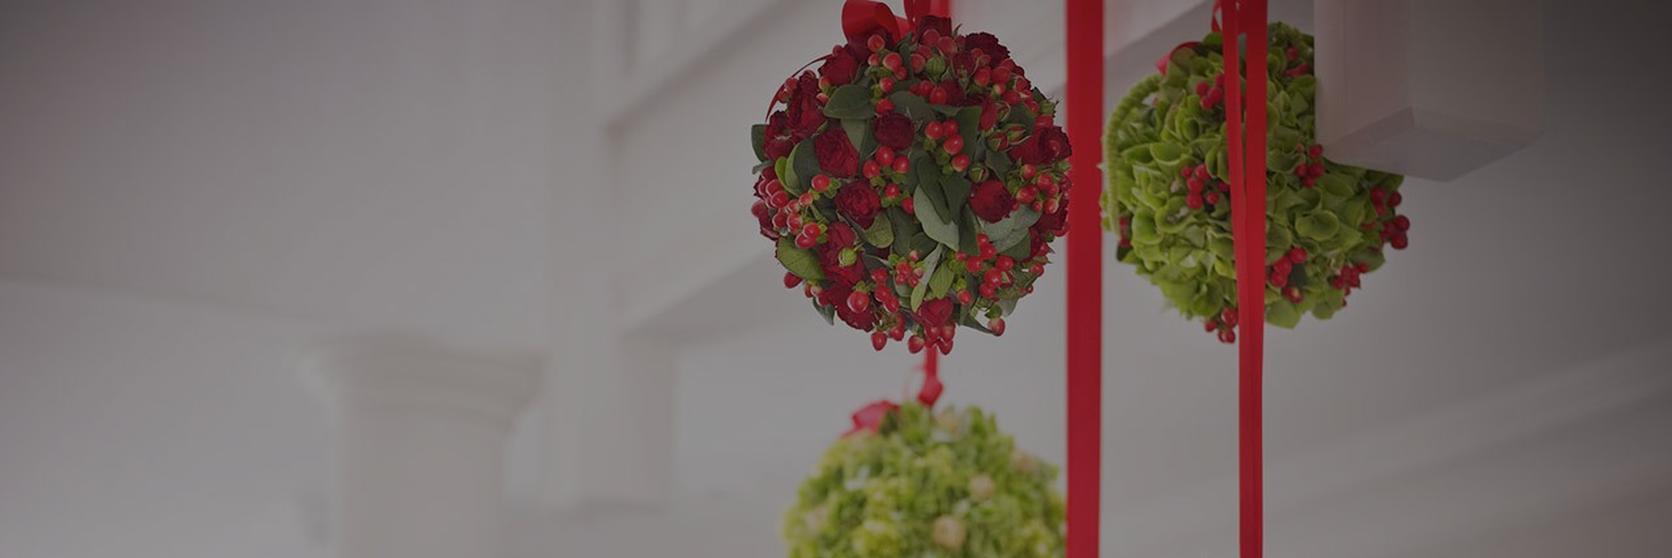 christmas-decorating-ideas-2-1